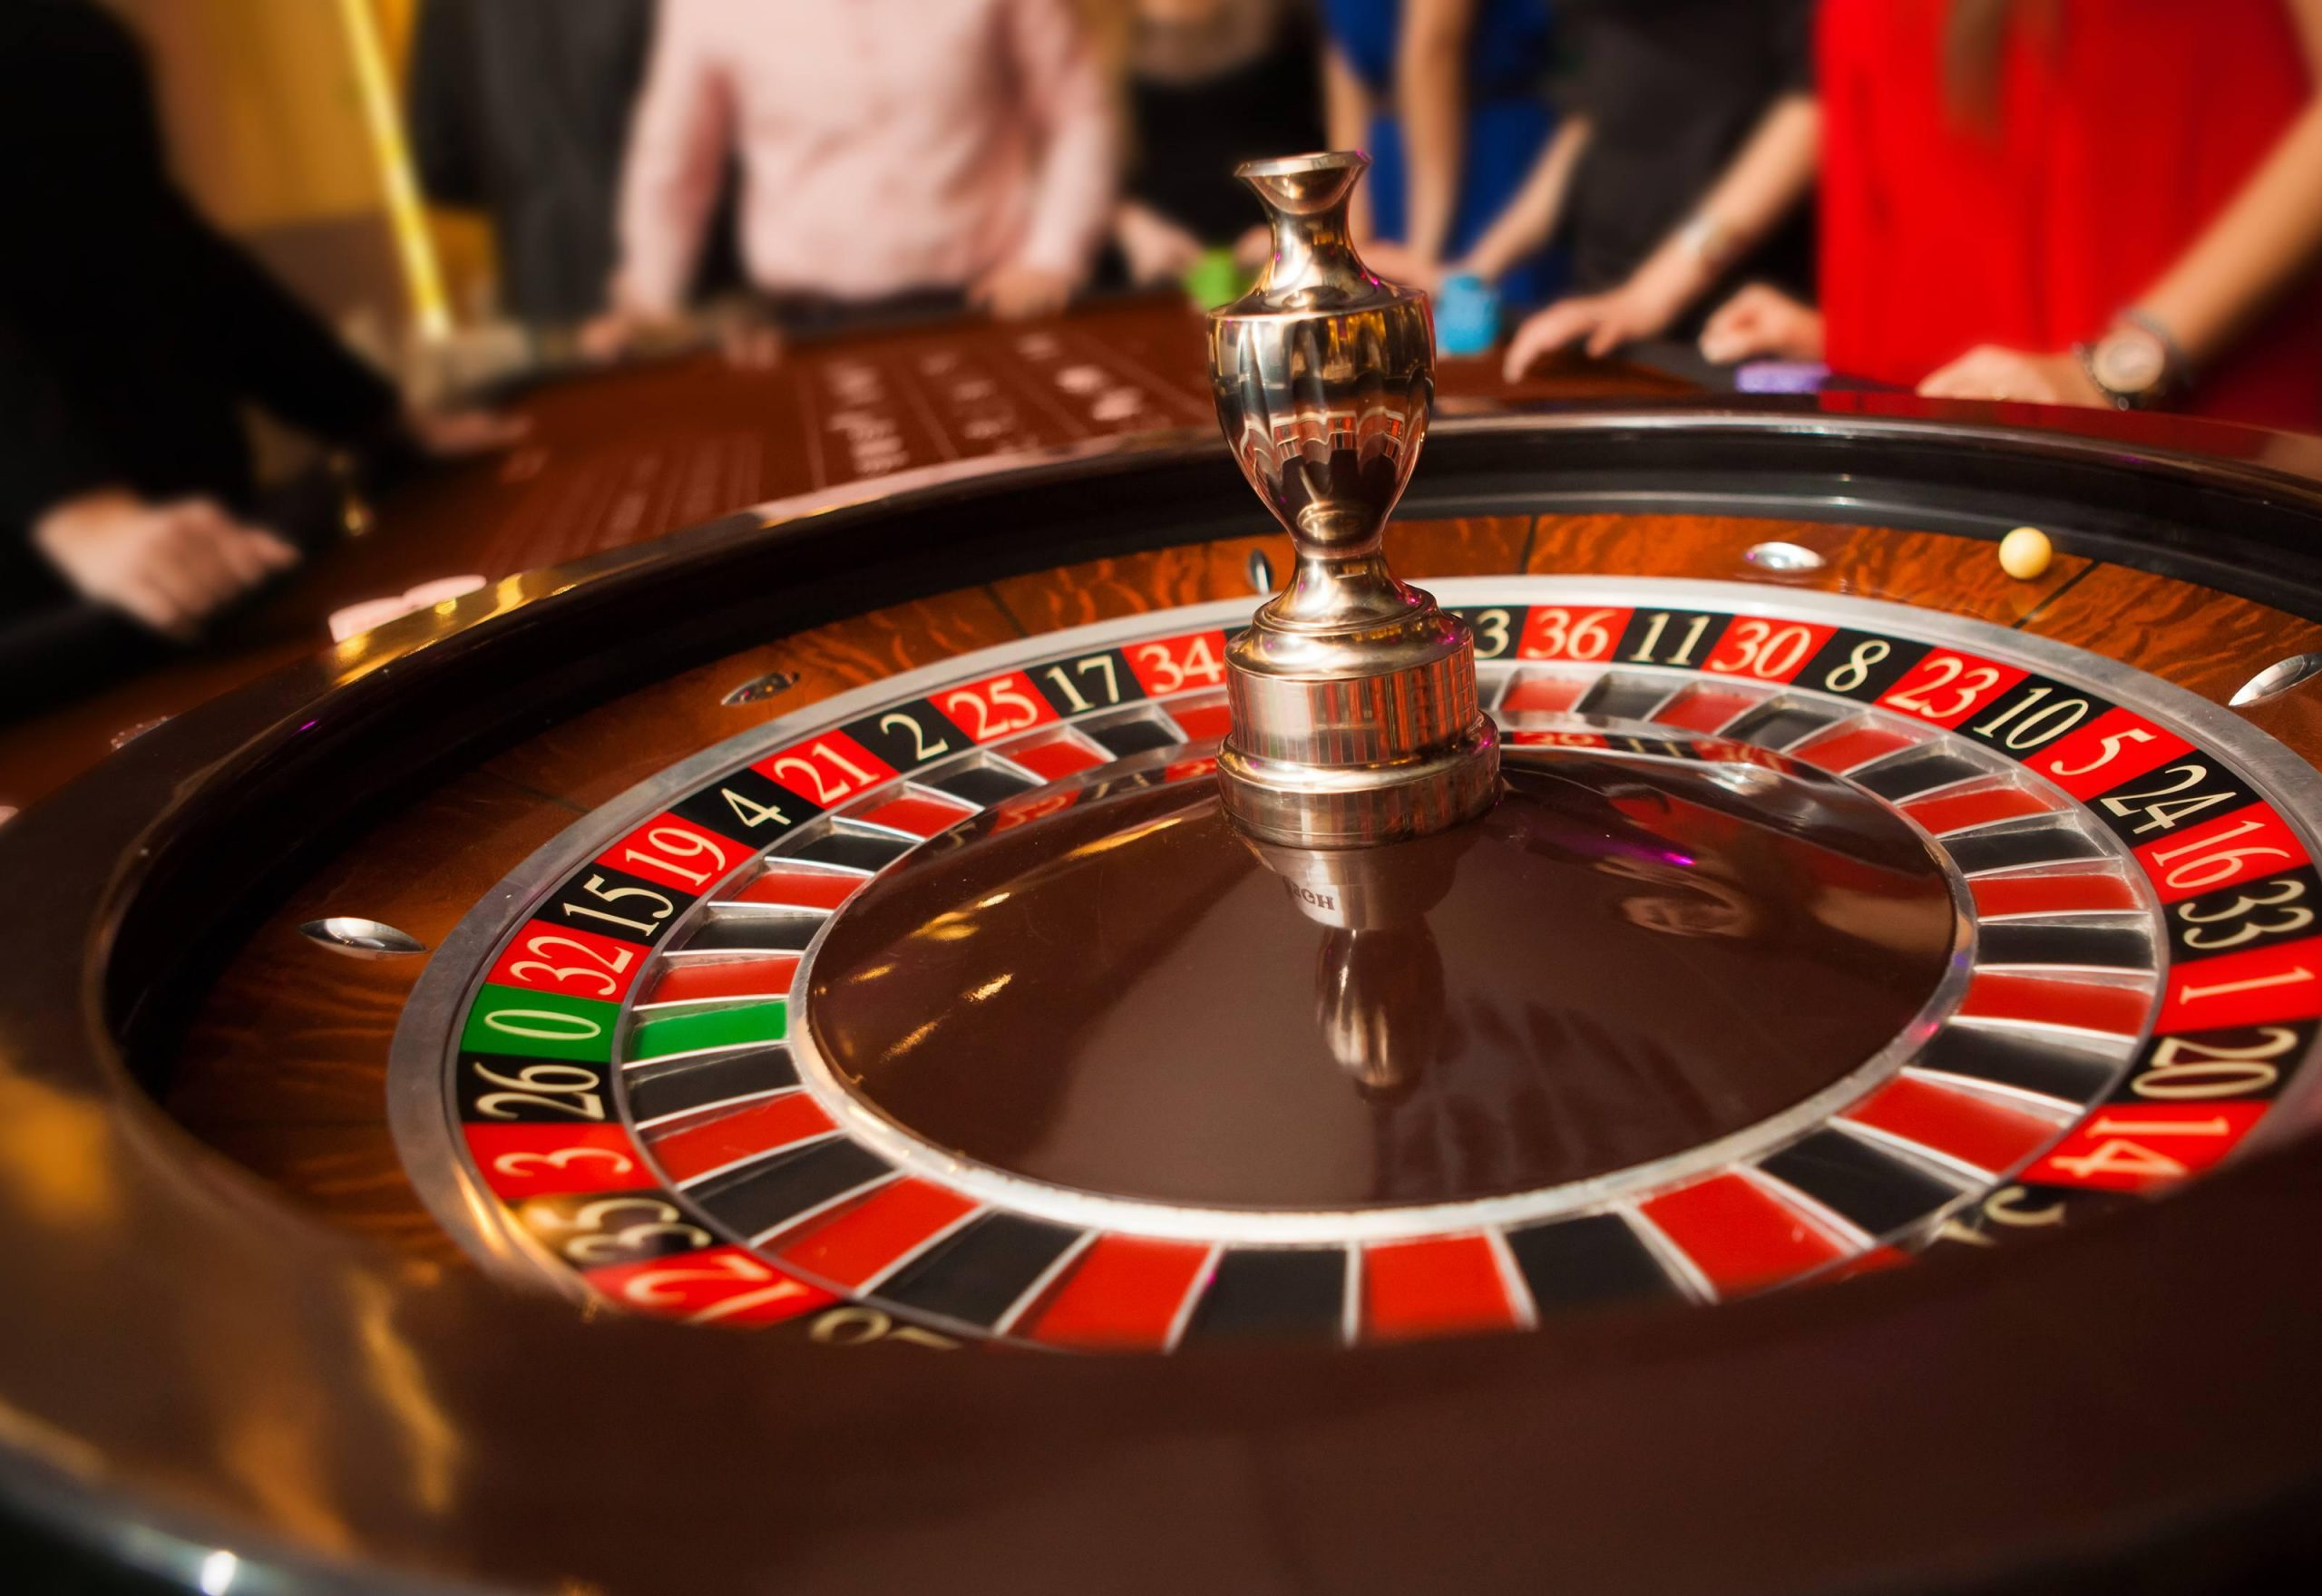 Gamble at the Casino